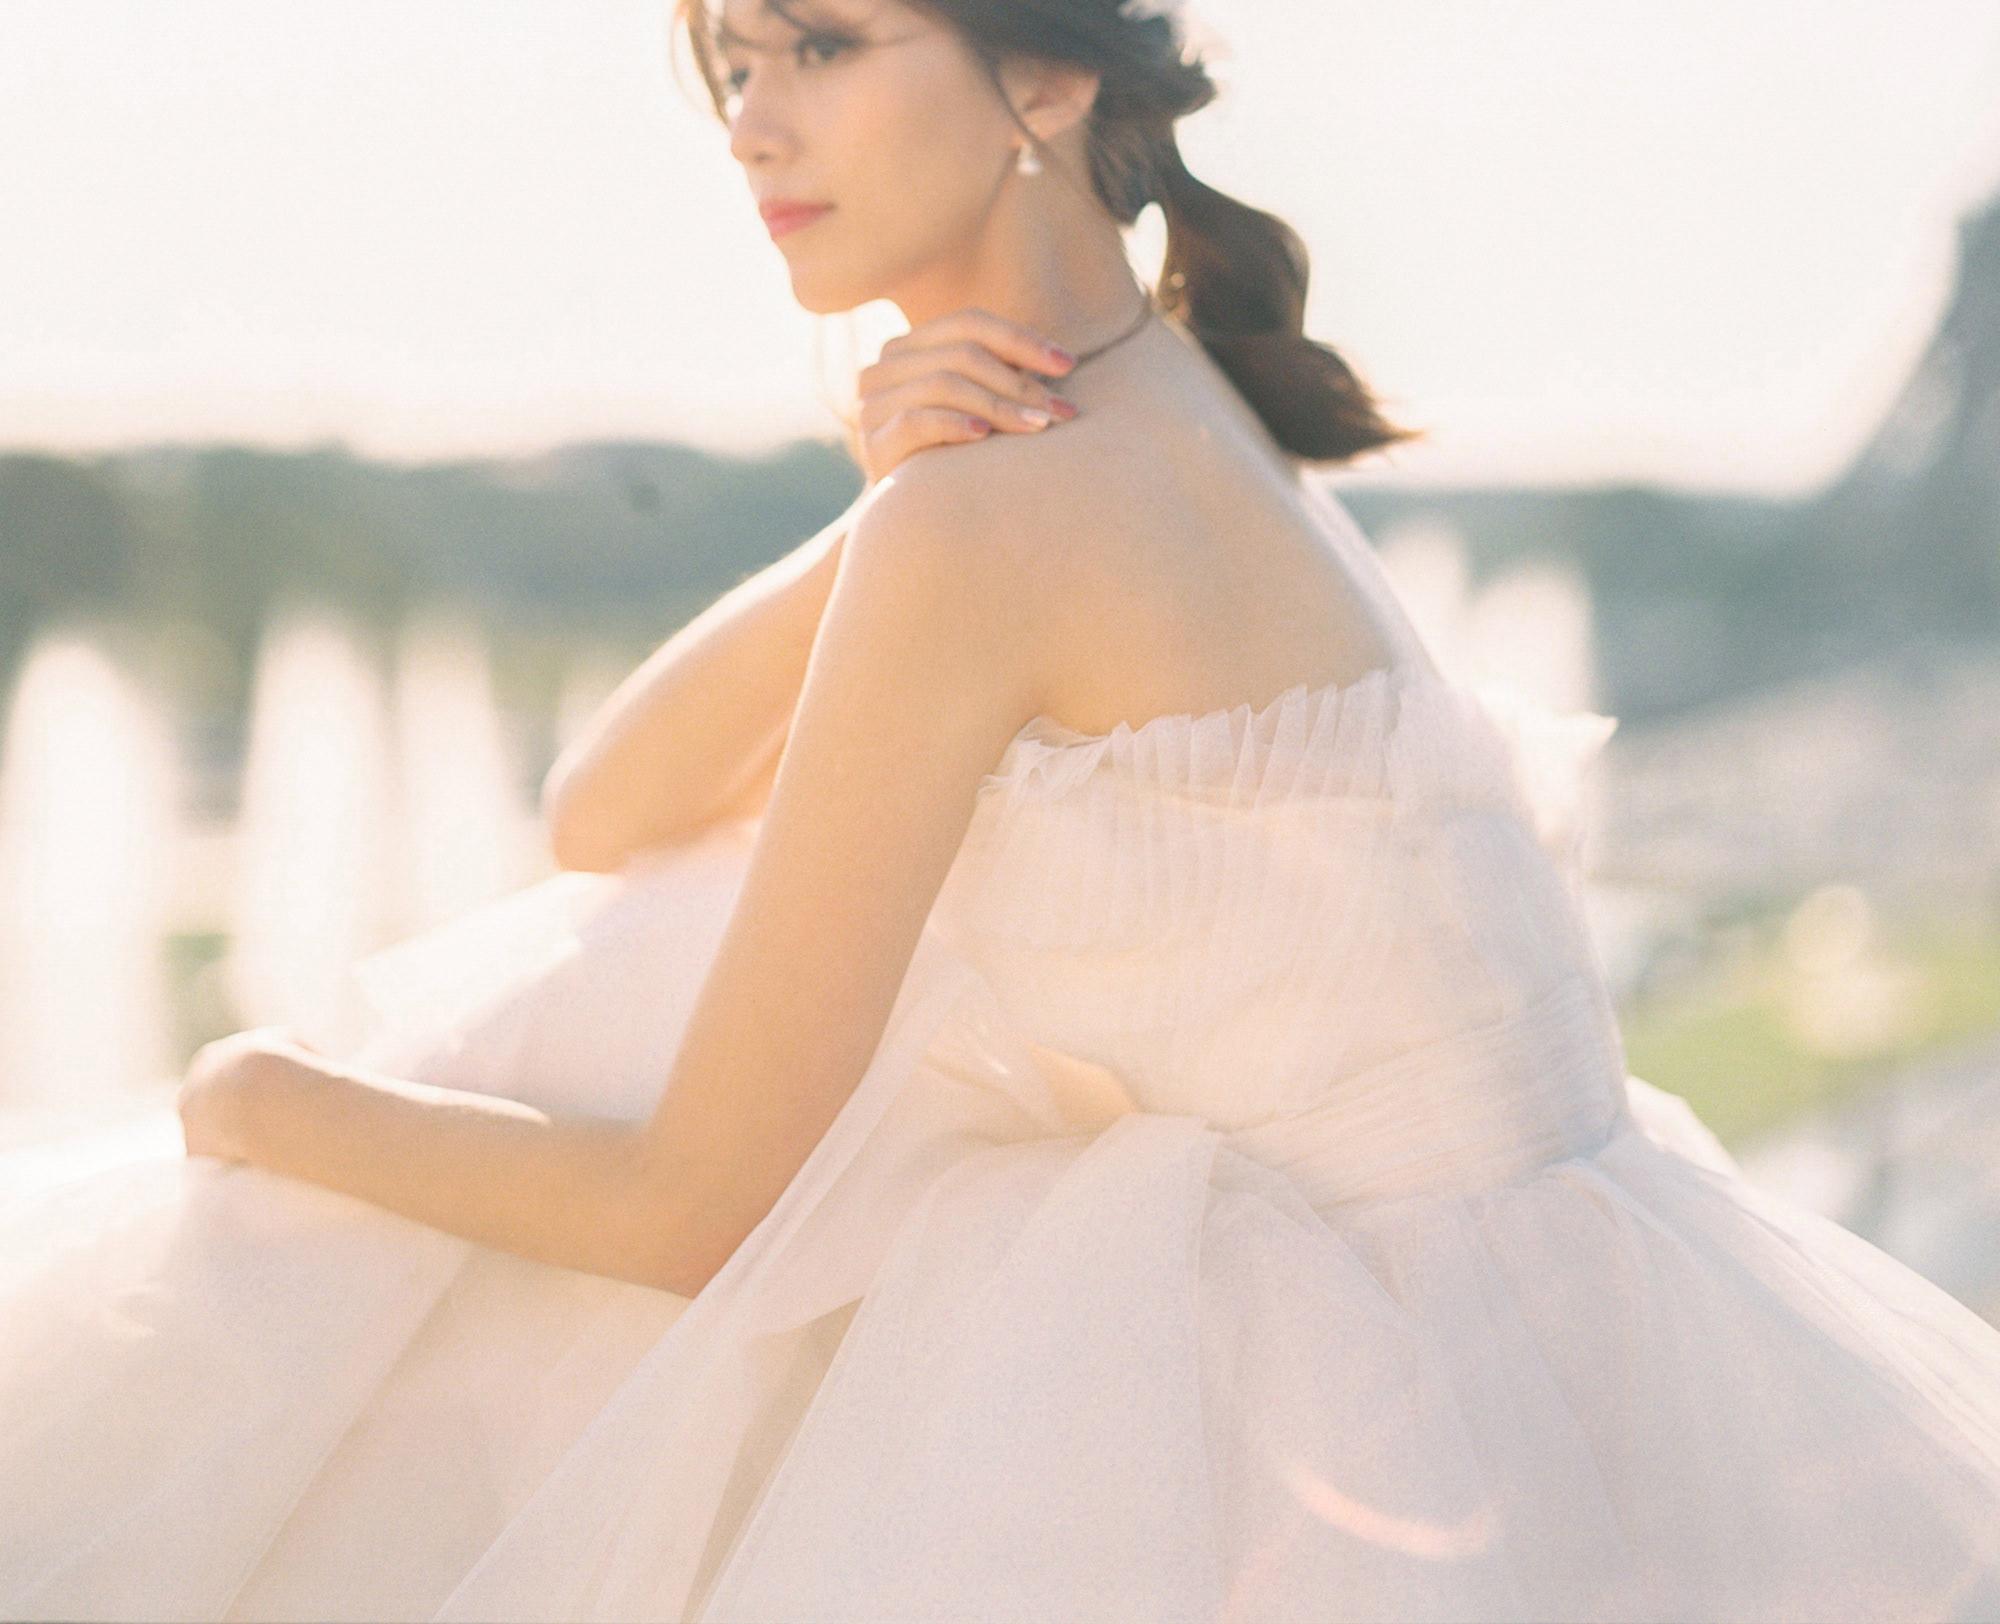 chymo_more_fine_art_wedding_photographer_paris_2.jpg